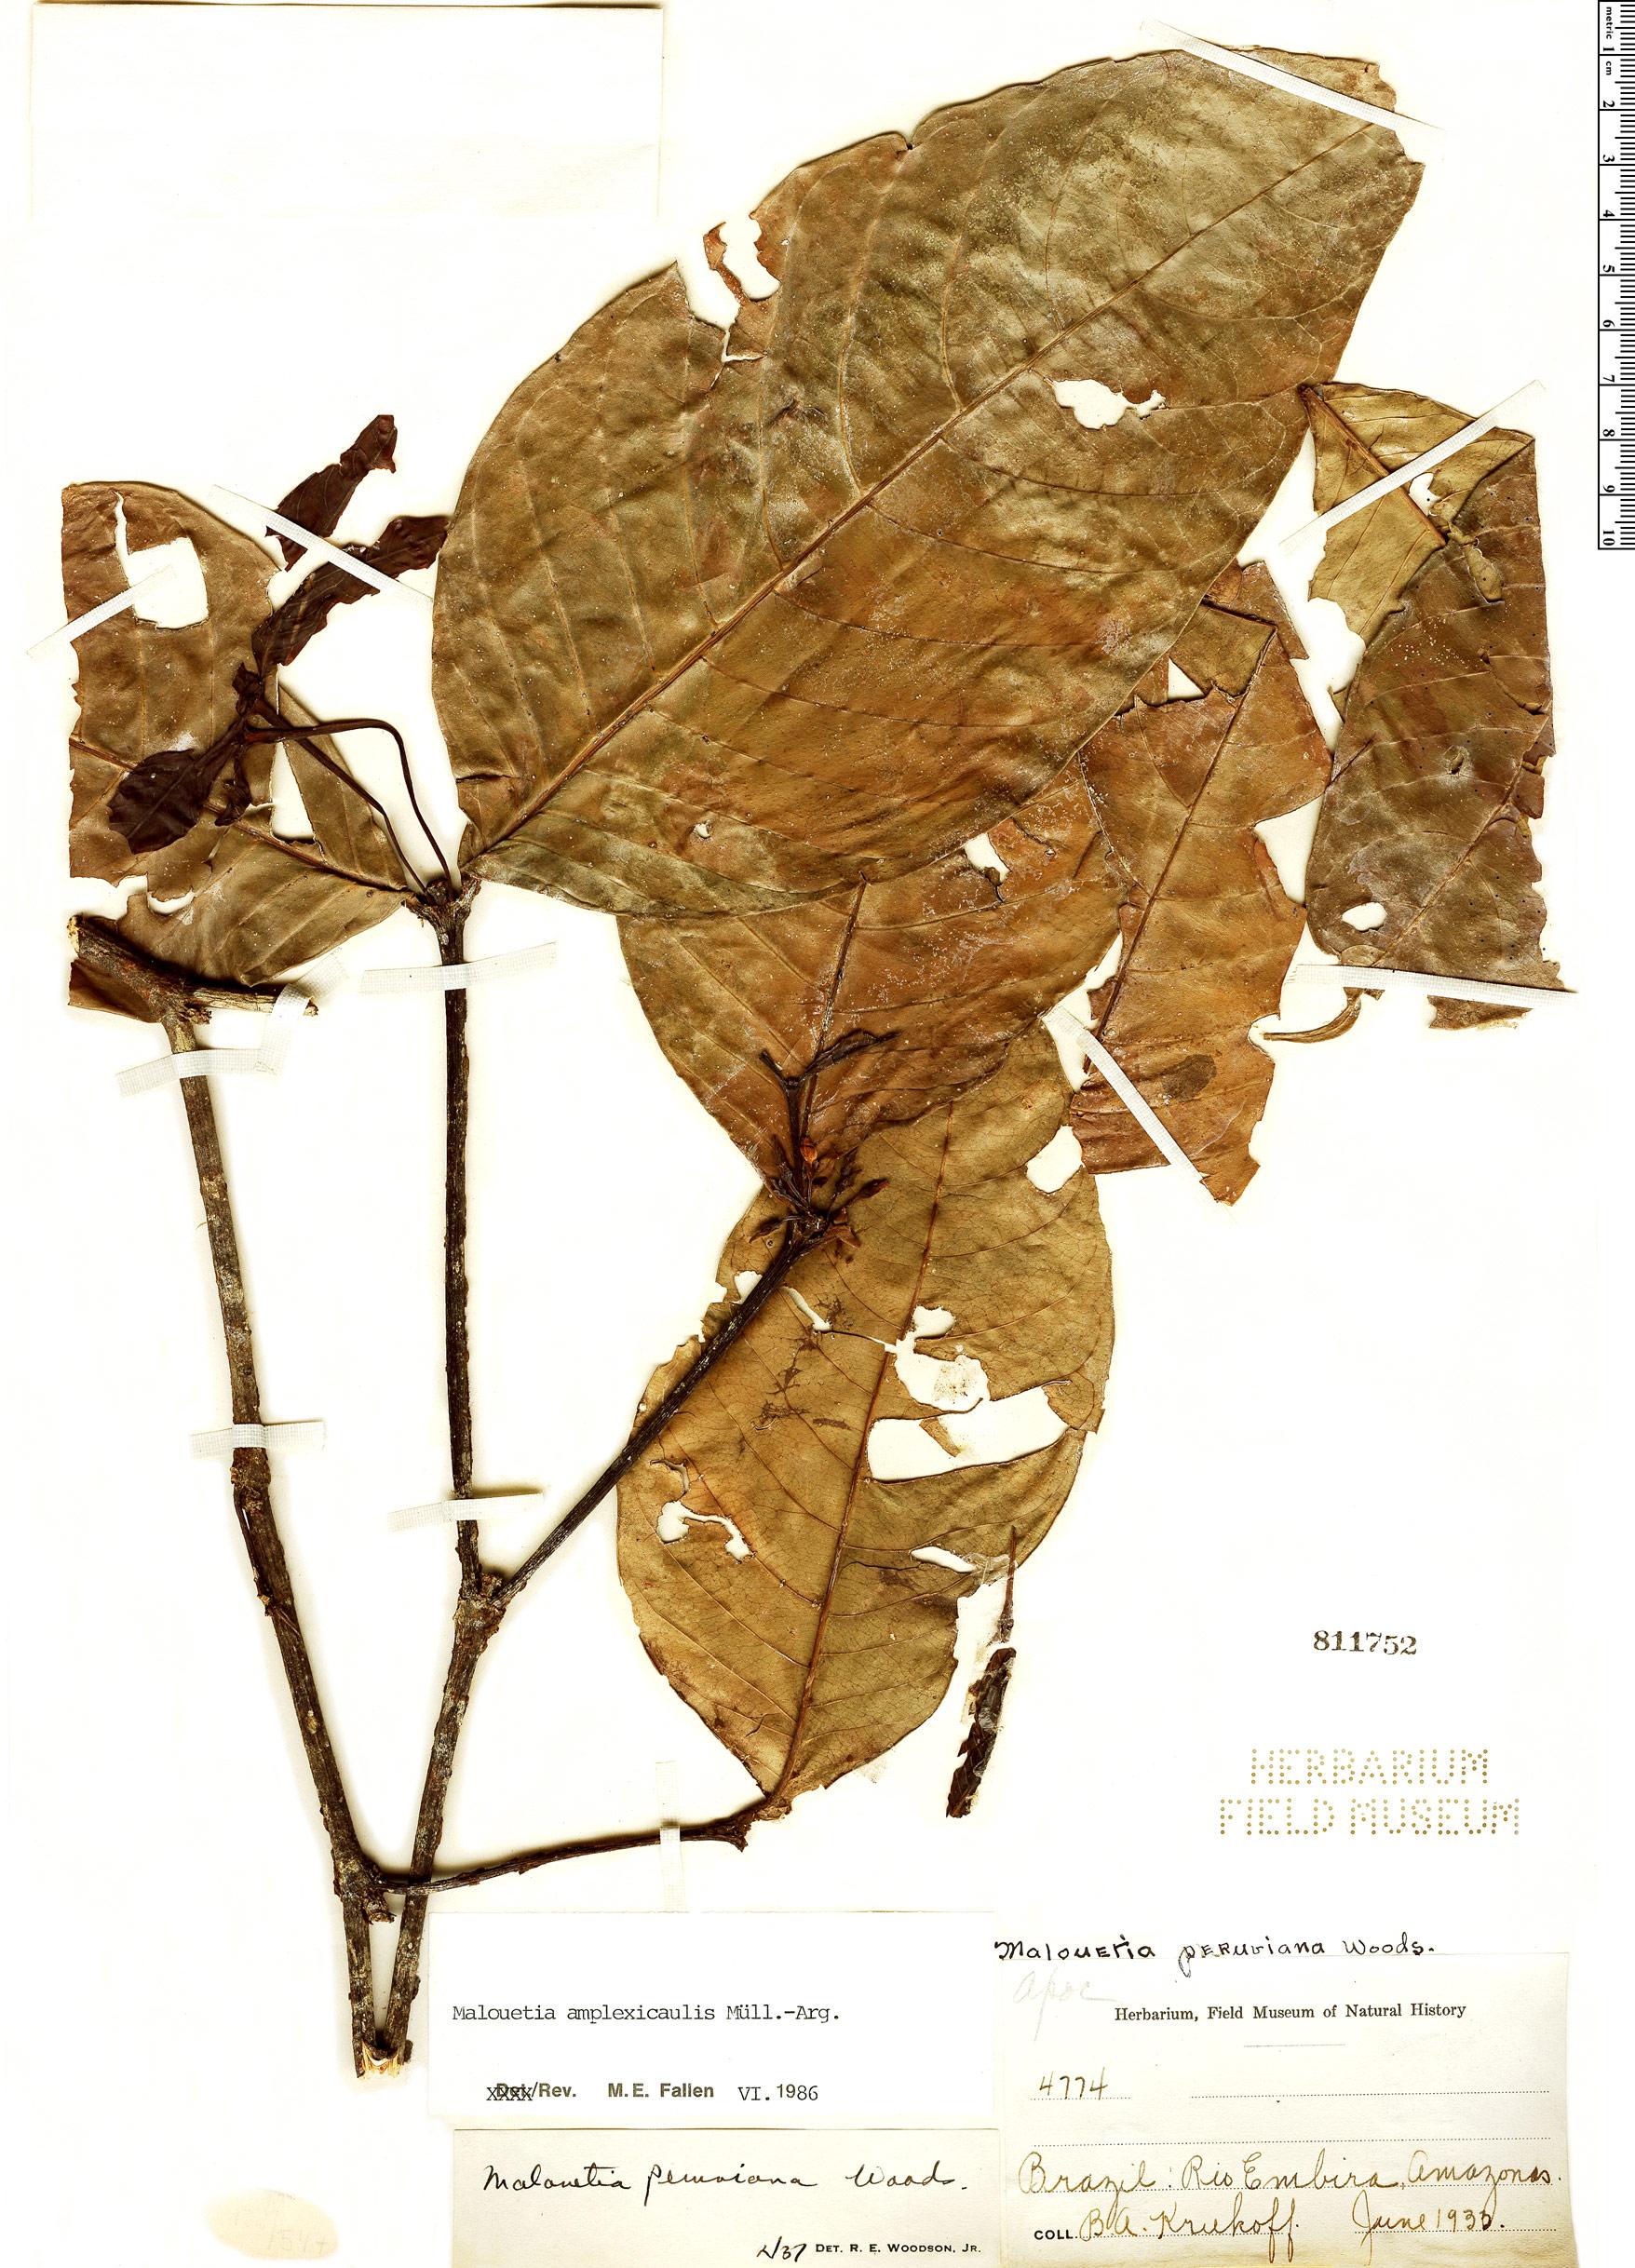 Espécimen: Malouetia amplexicaulis